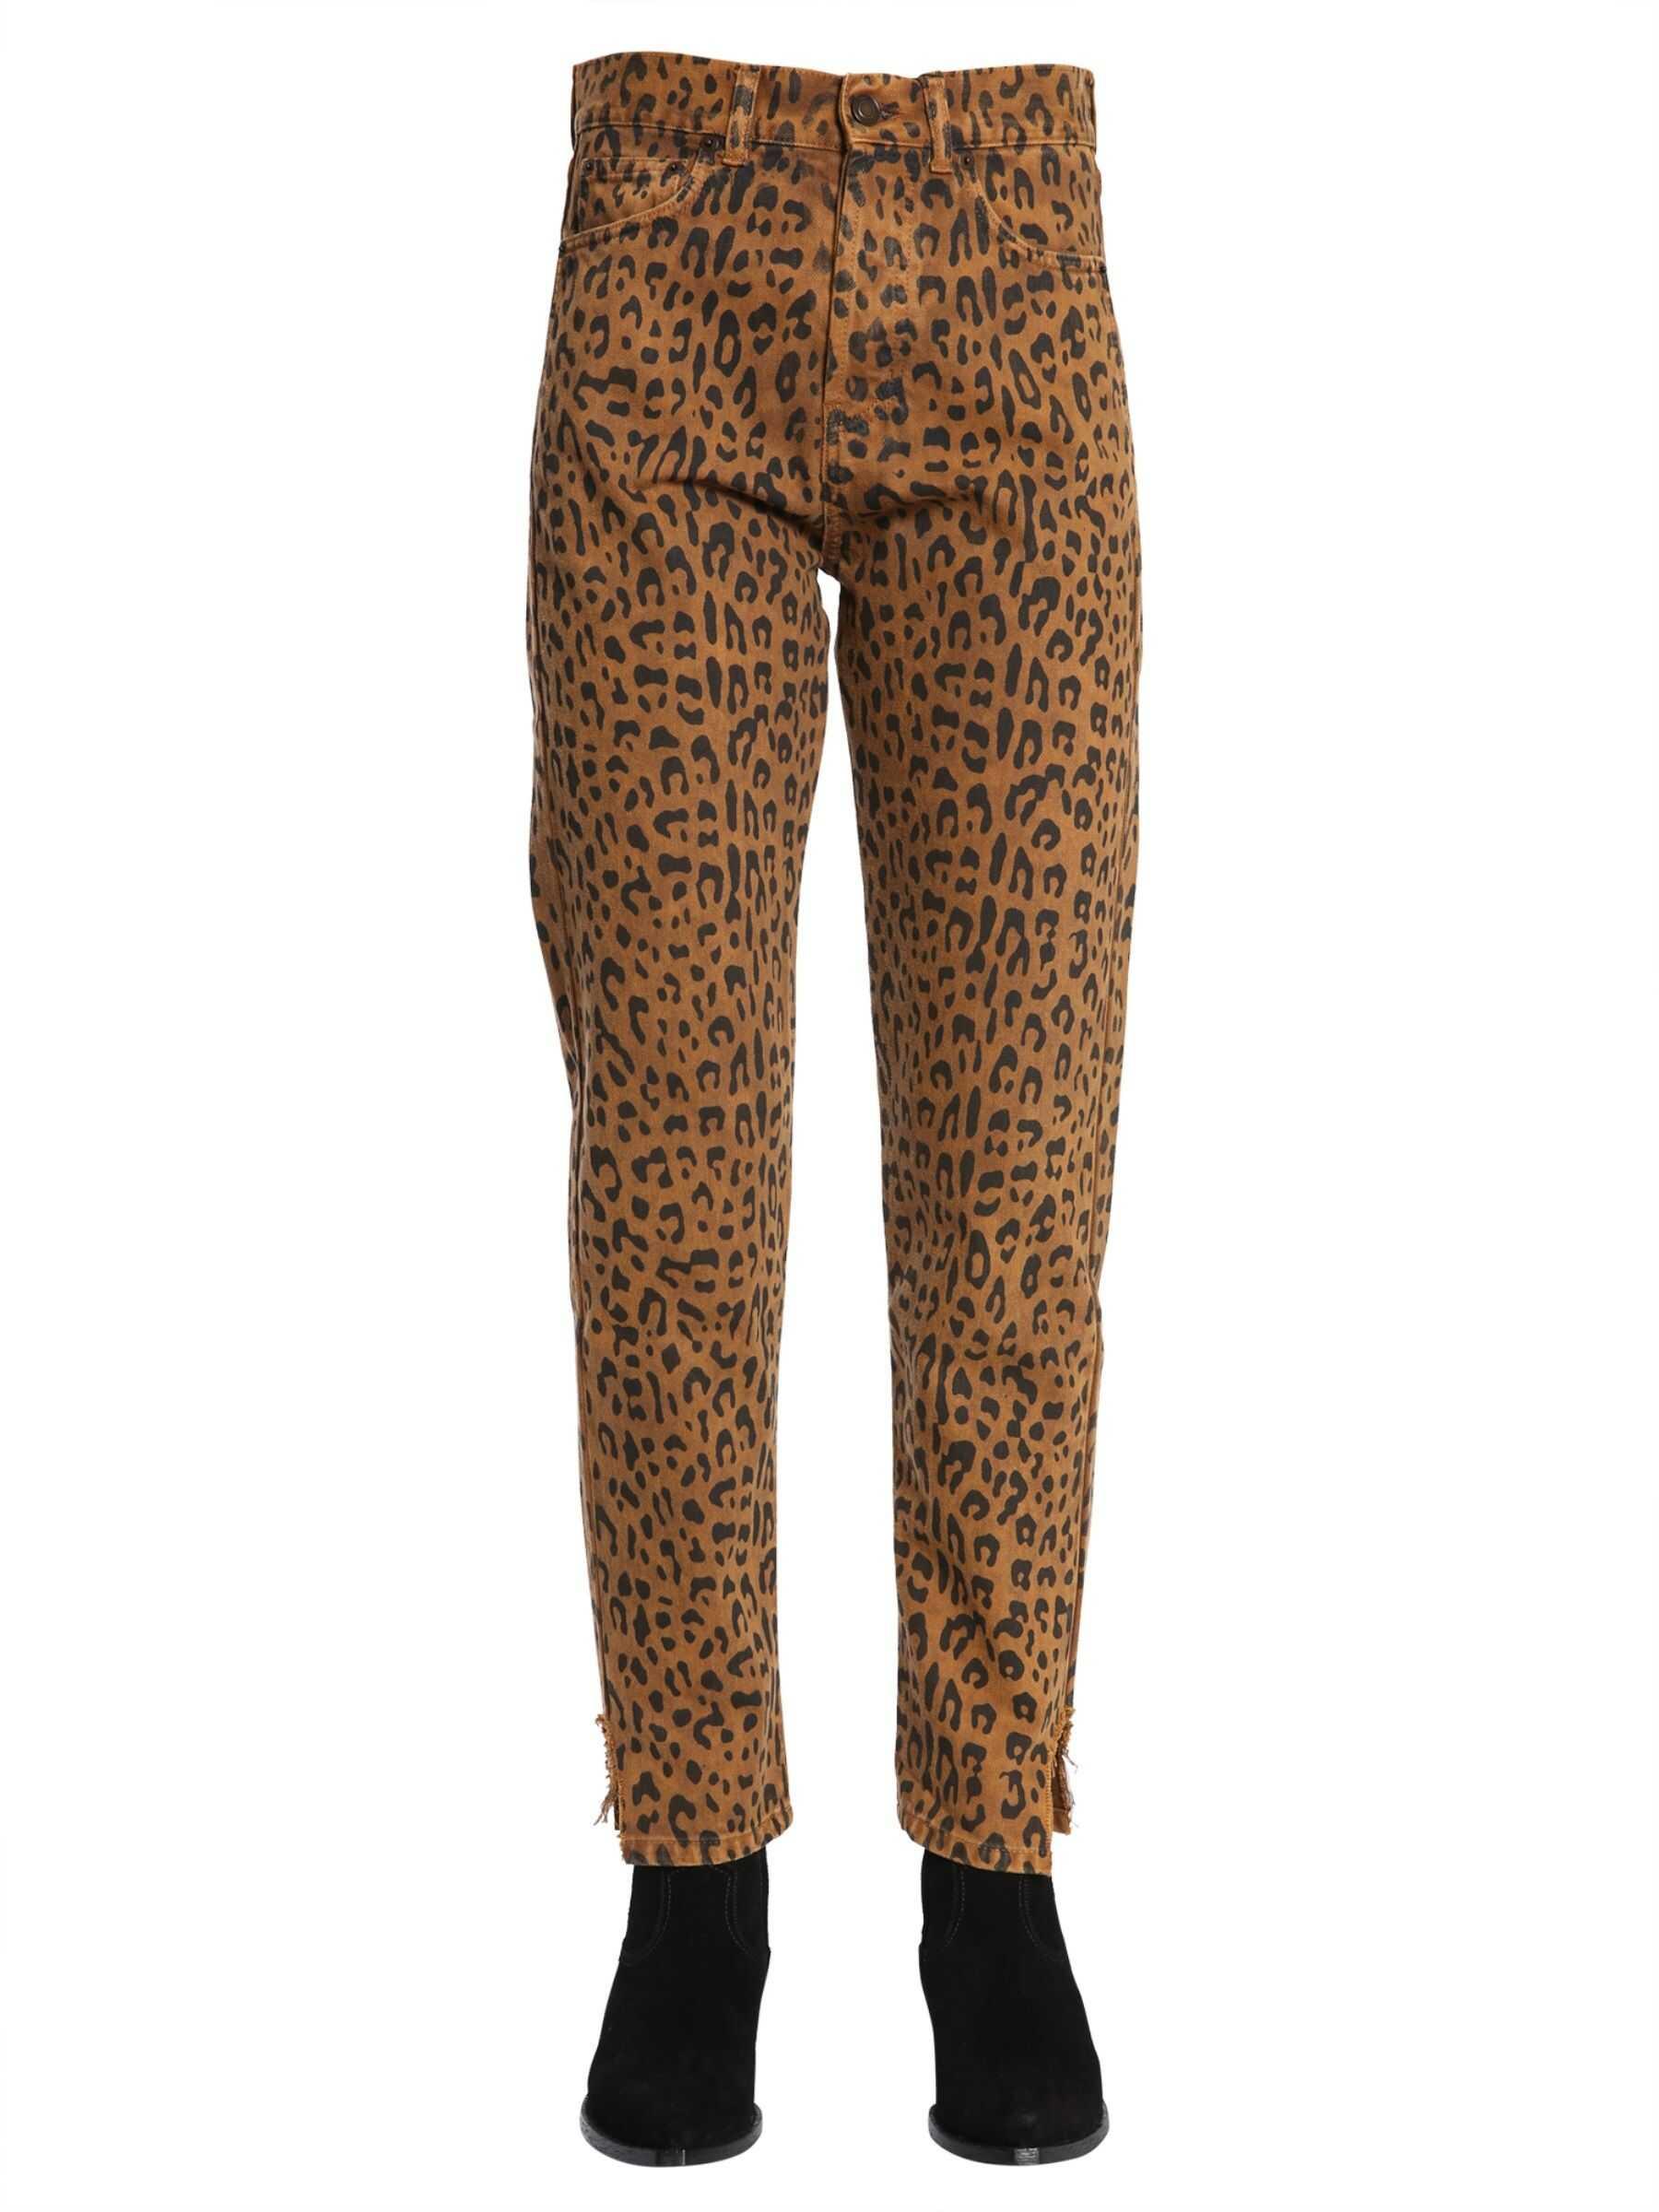 Saint Laurent Slim Fit Hjeans In Leopard Print BROWN